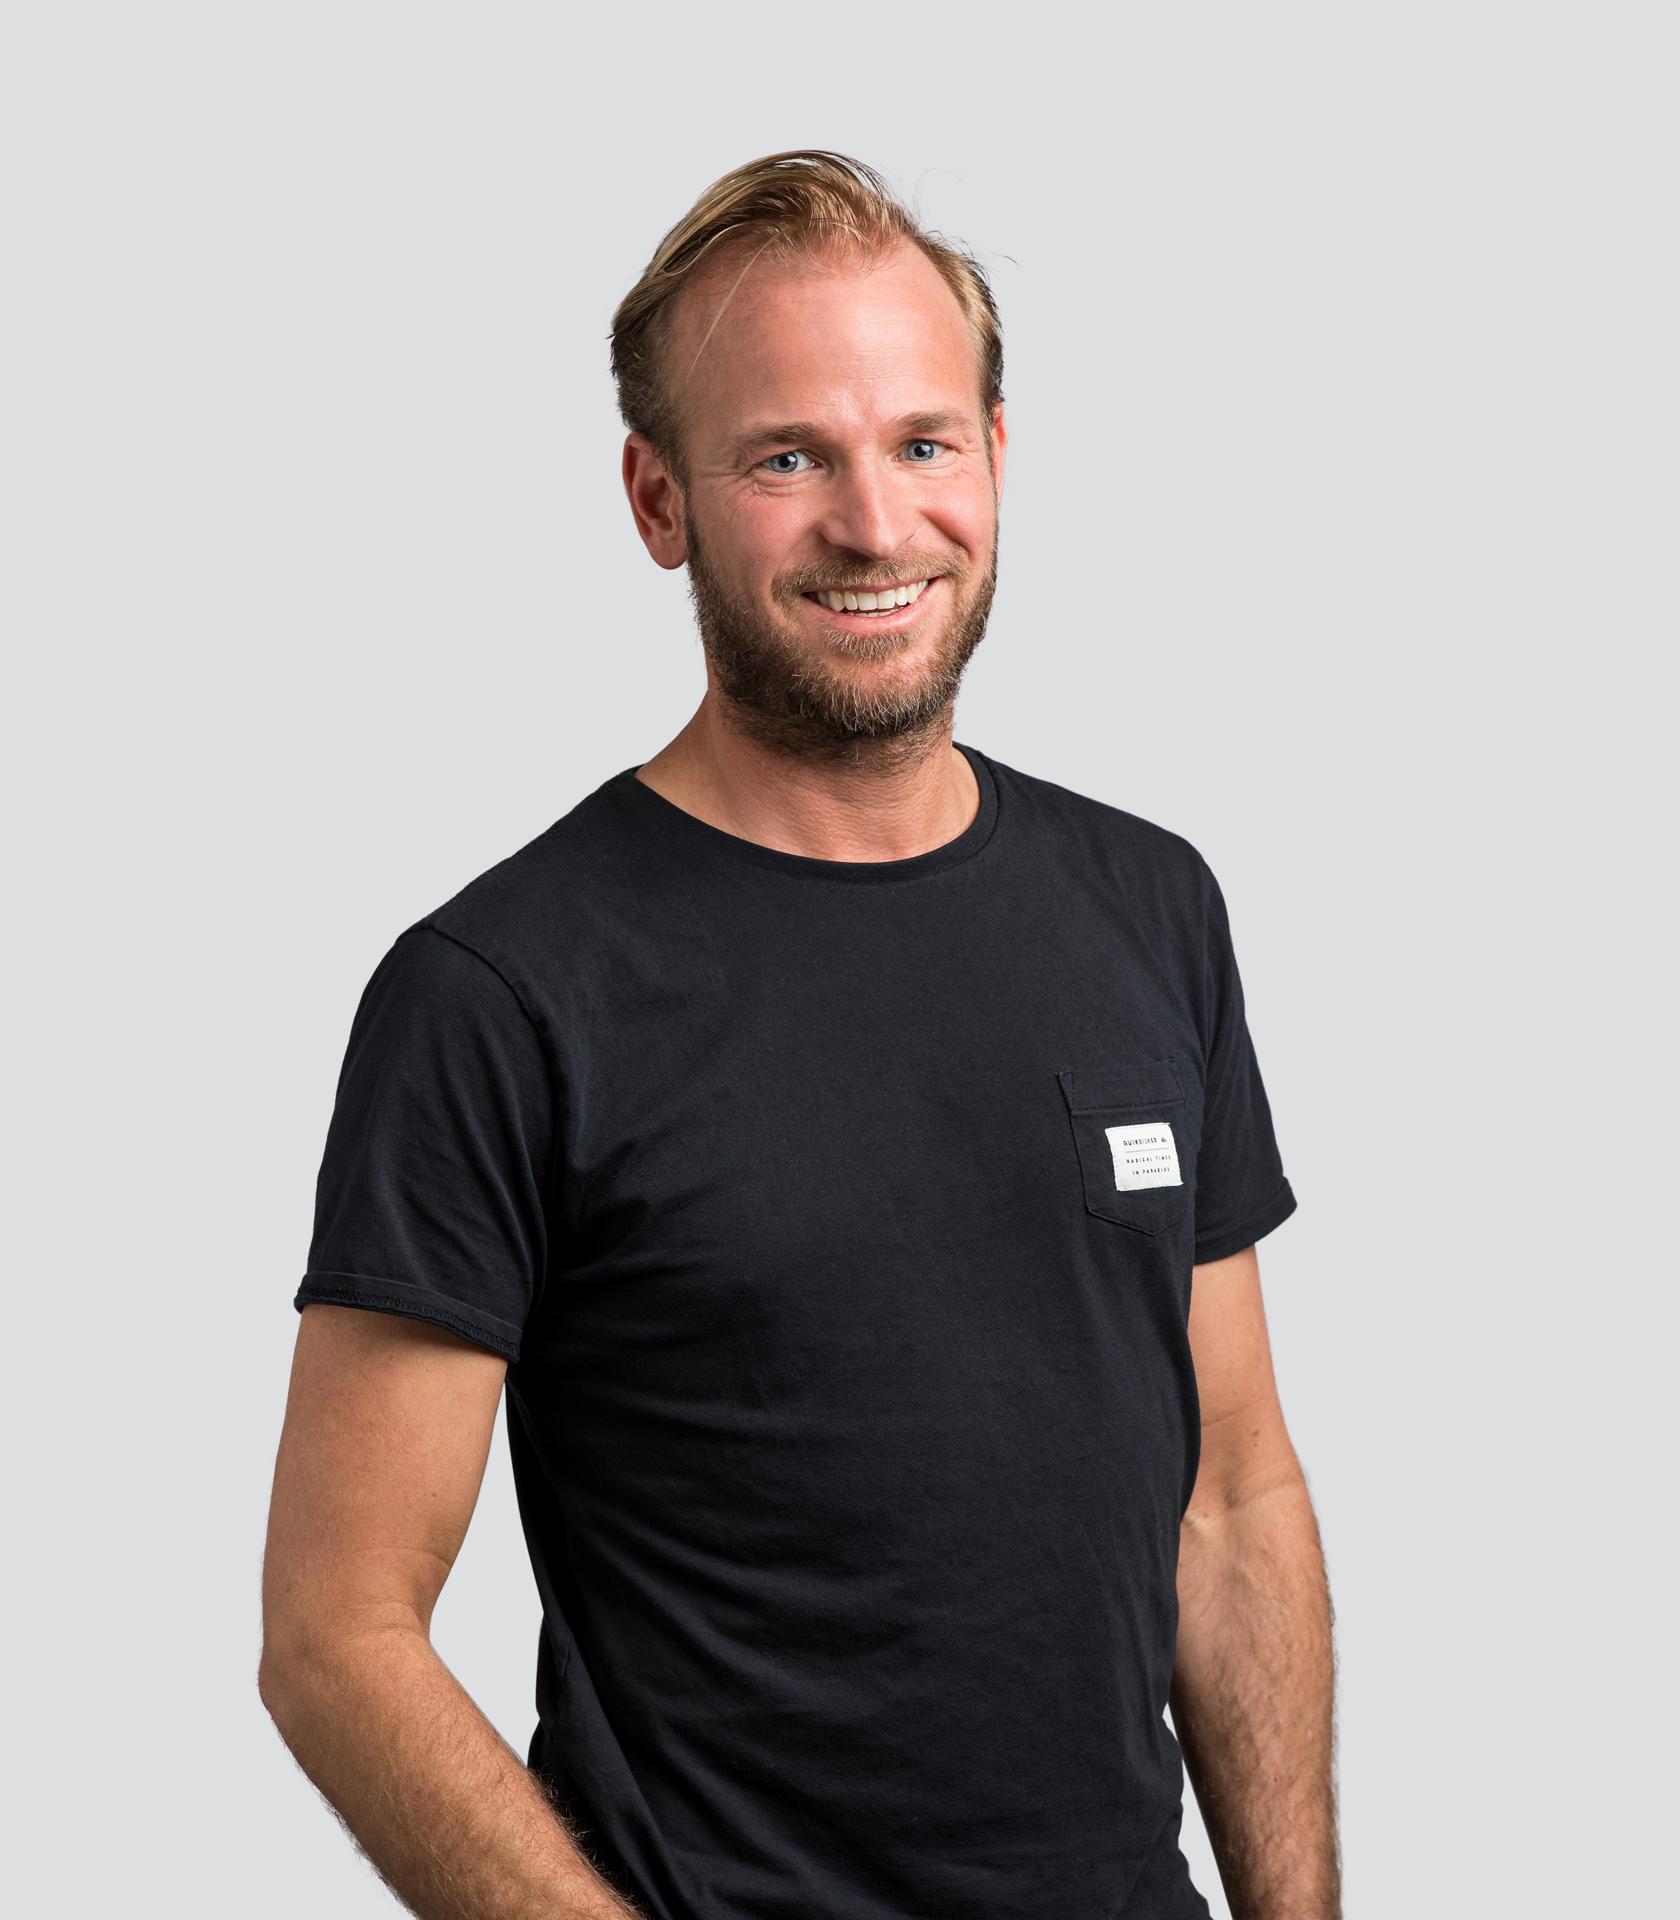 Joep Roosen